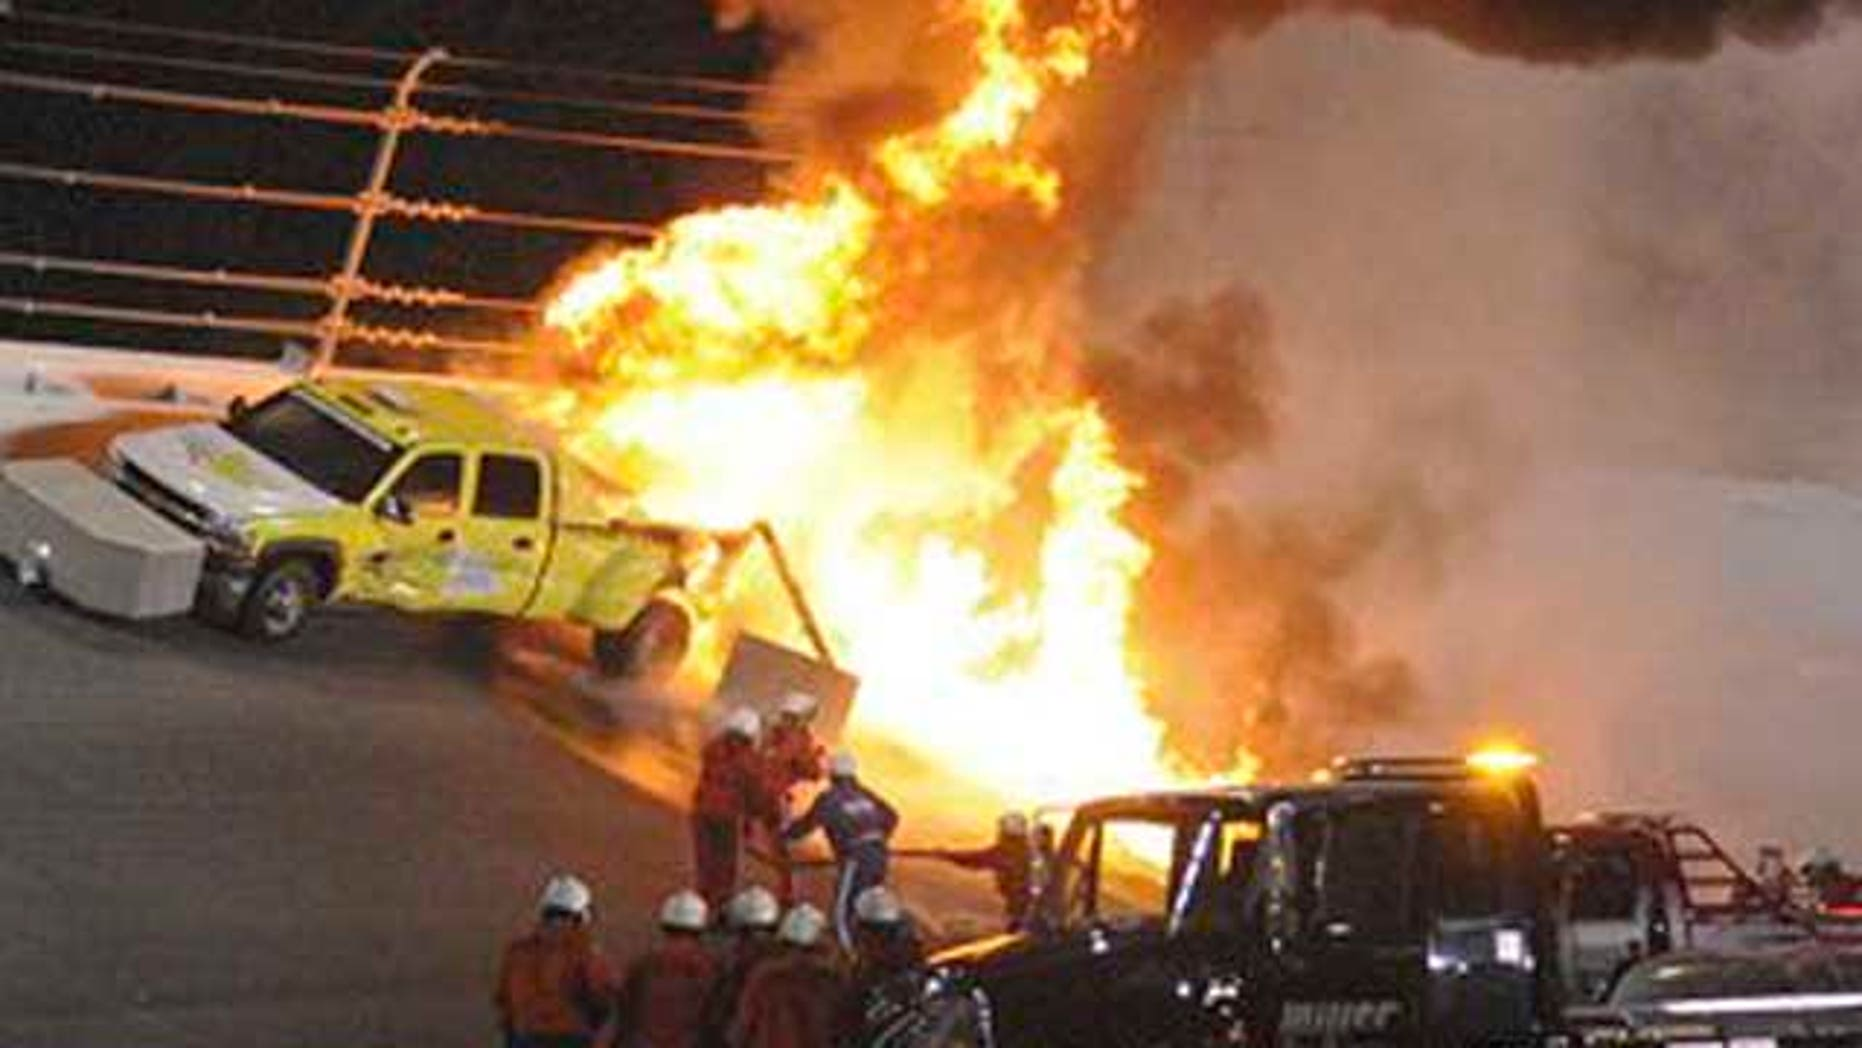 Feb. 27, 2012: Emergency workers try to extinguish a fire on a jet dryer during the NASCAR Daytona 500 auto race at Daytona International Speedway in Daytona Beach, Fla.